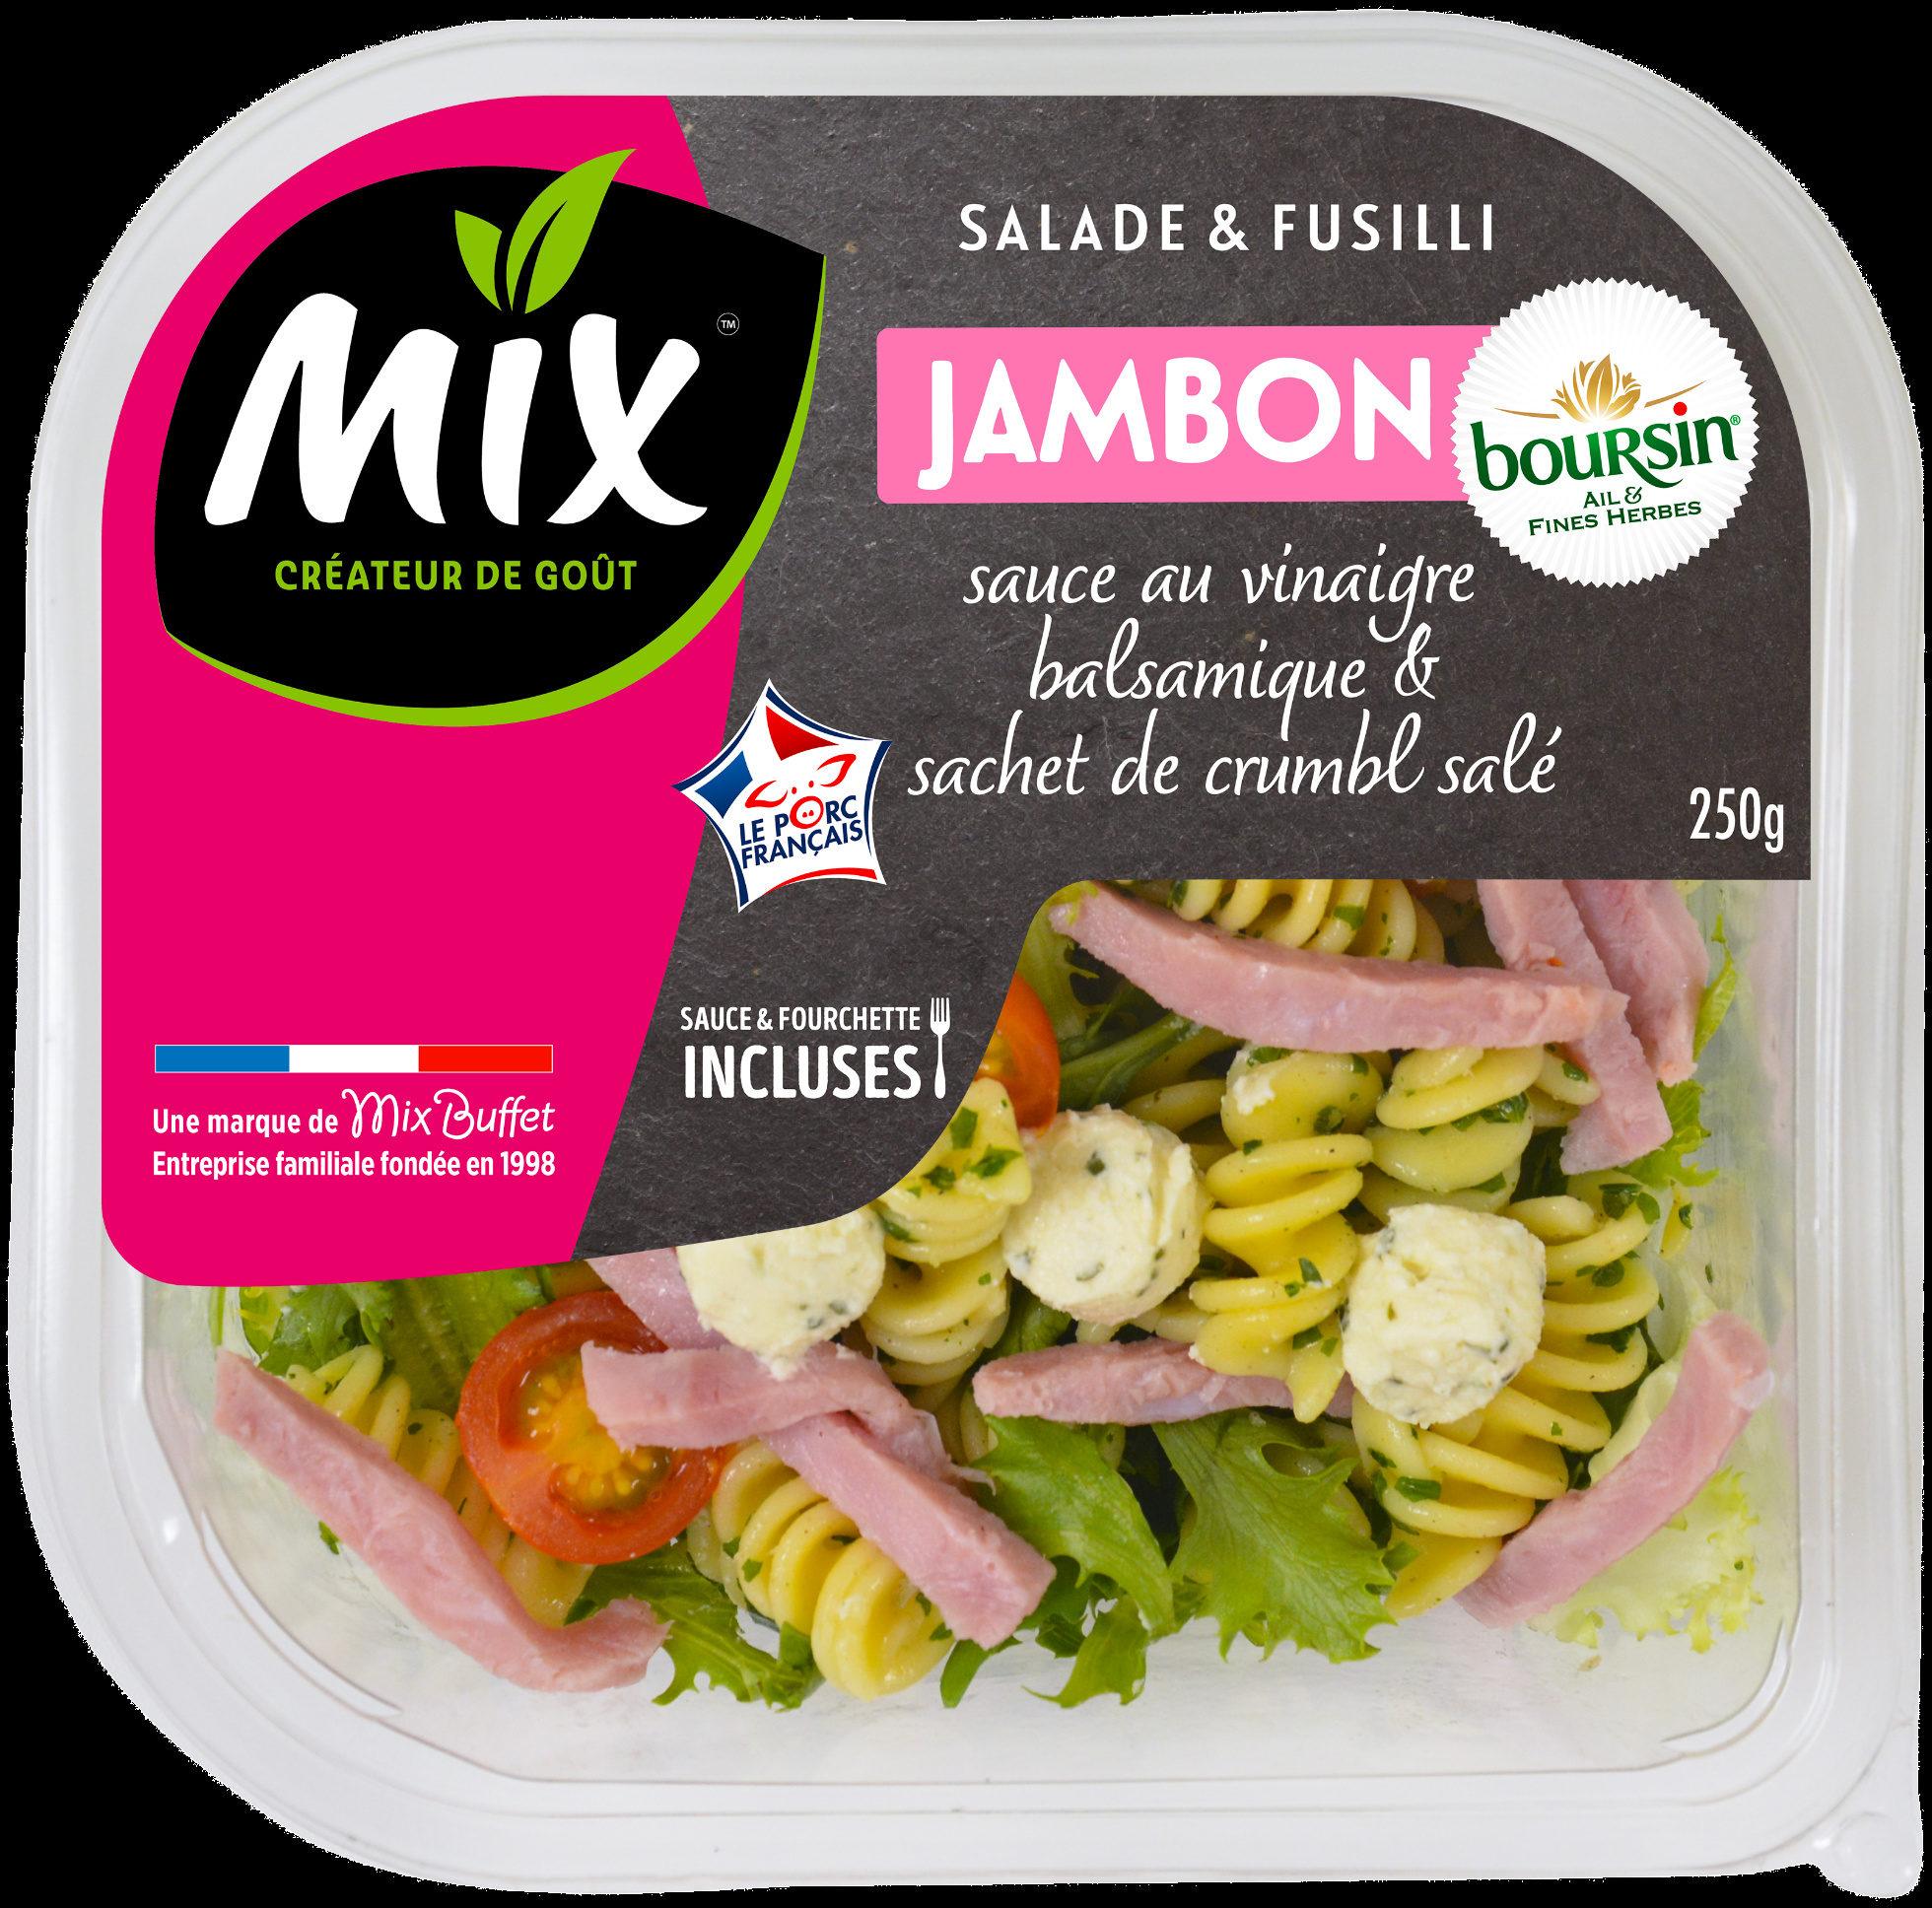 Salade&fusilli jambon fromage boursin - Product